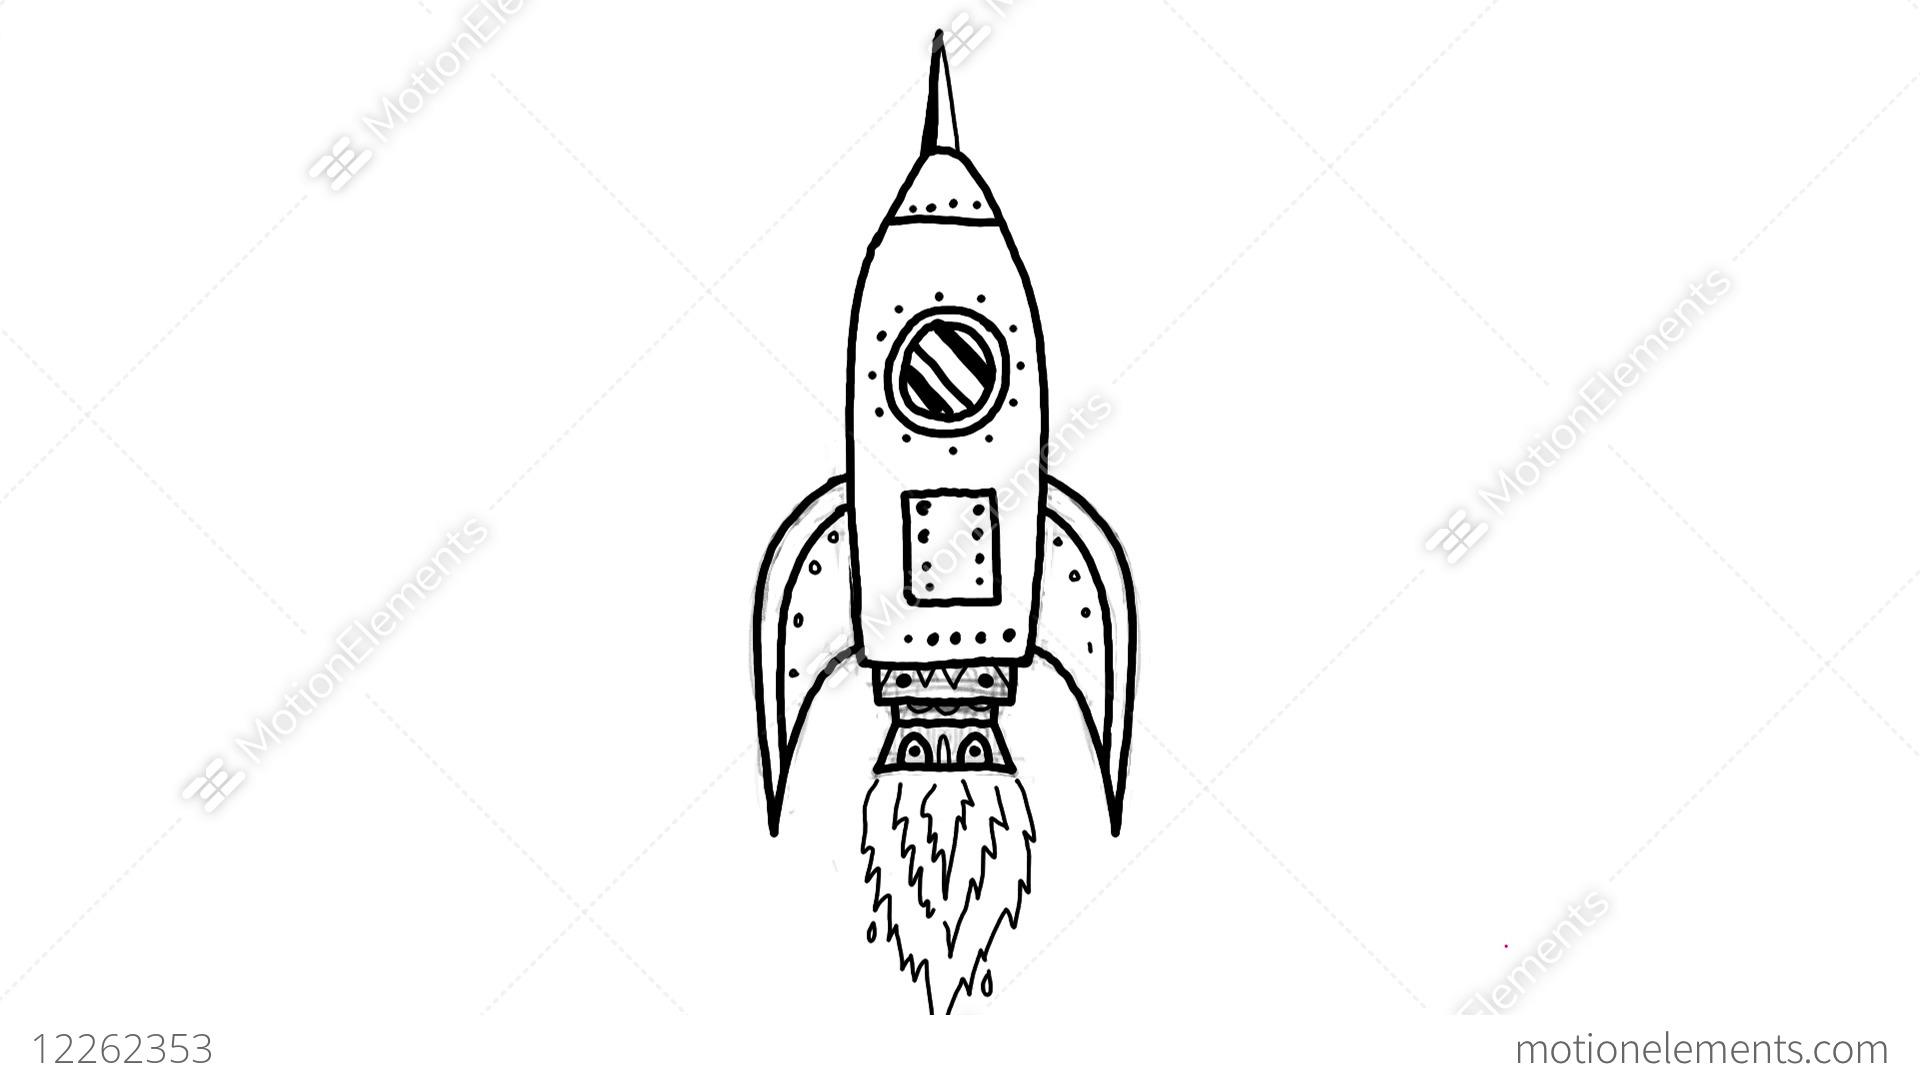 Vintage Rocket Ship Blasting Off Drawing 2D Animation